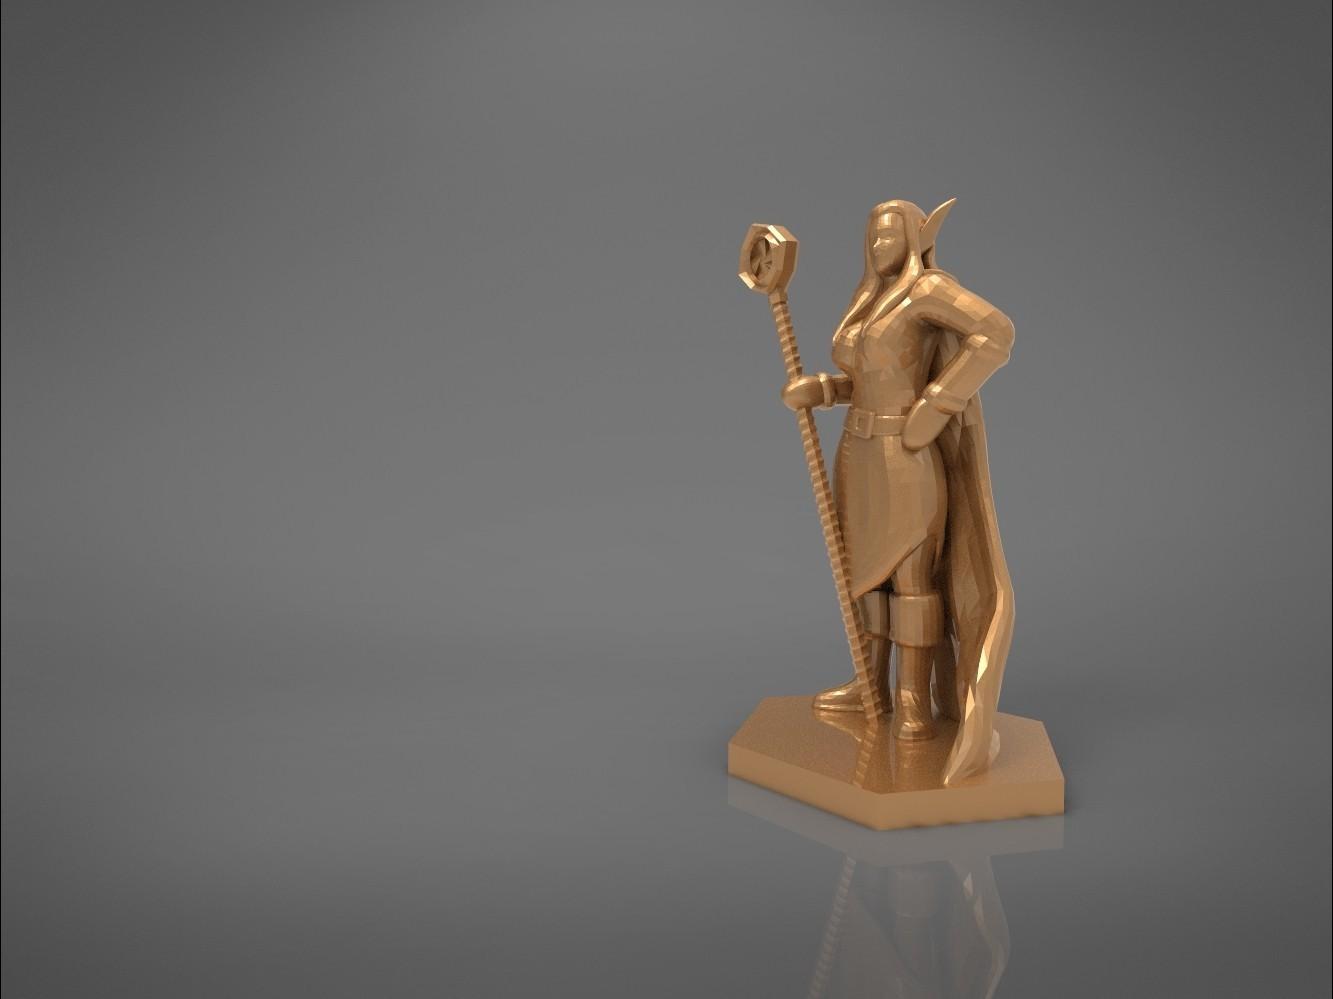 Mage_2_-main_render.165.jpg Download STL file ELF MAGE FEMALE CHARACTER GAME FIGURES 3D print model • 3D printing template, 3D-mon